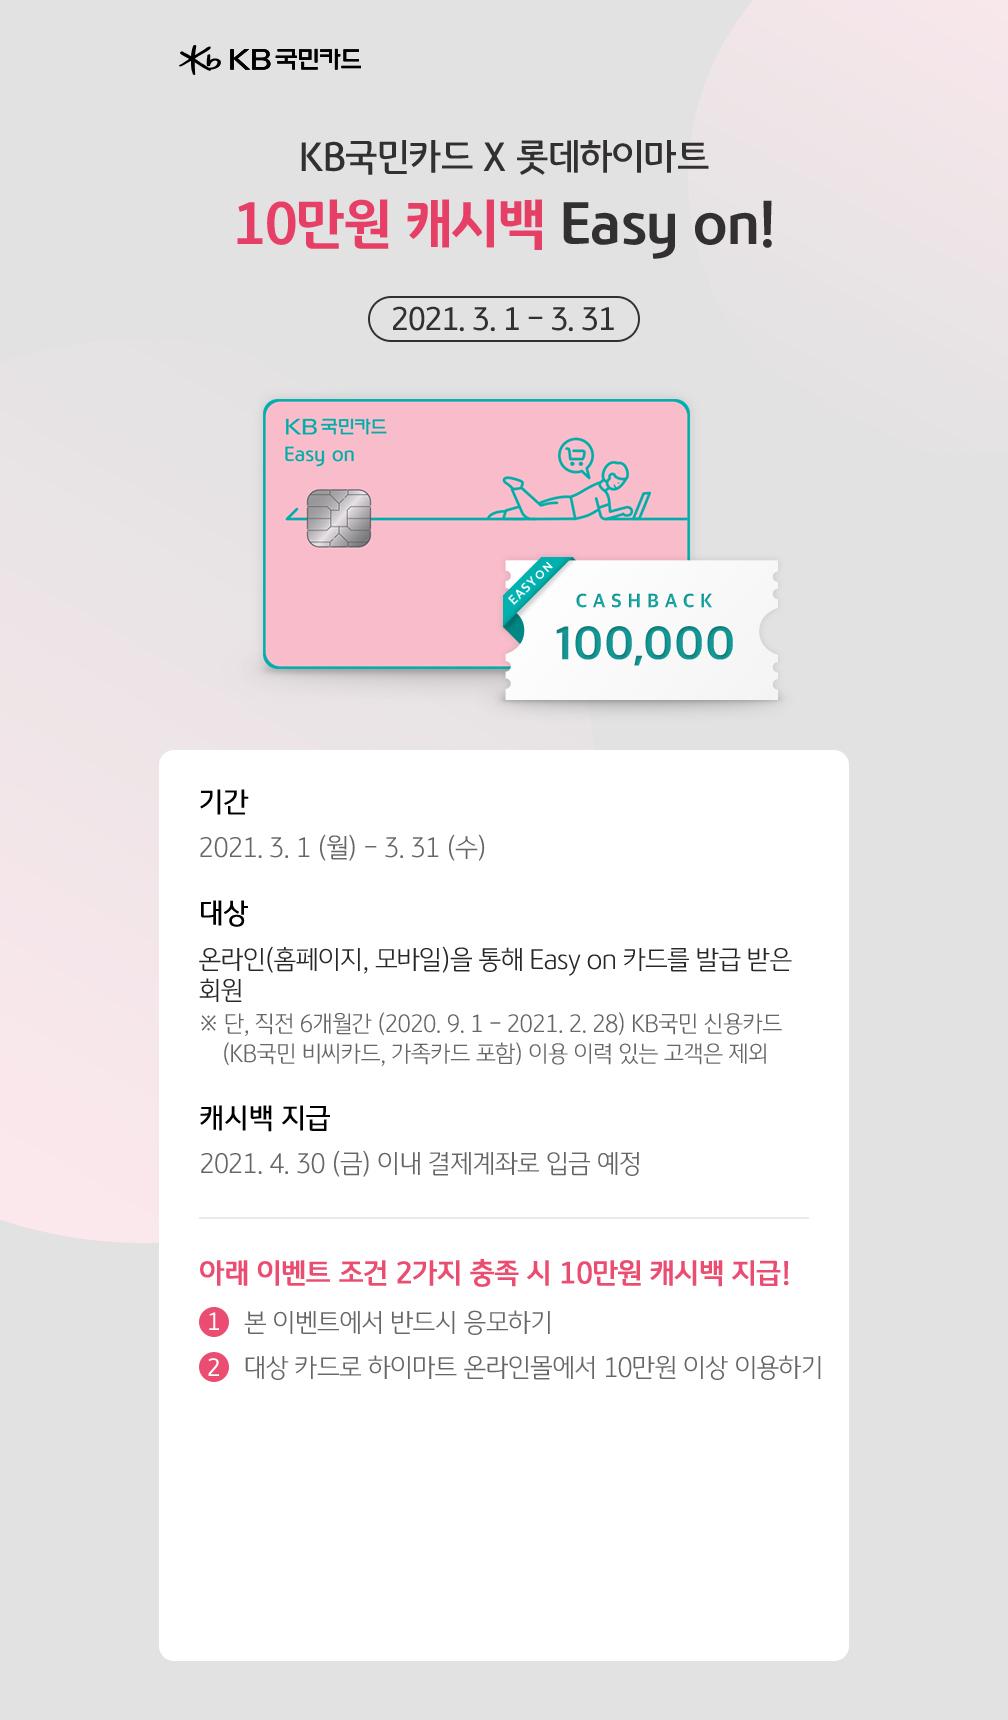 KB국민카드 X 롯데하이마트, 10만원 캐시백 Easy on!